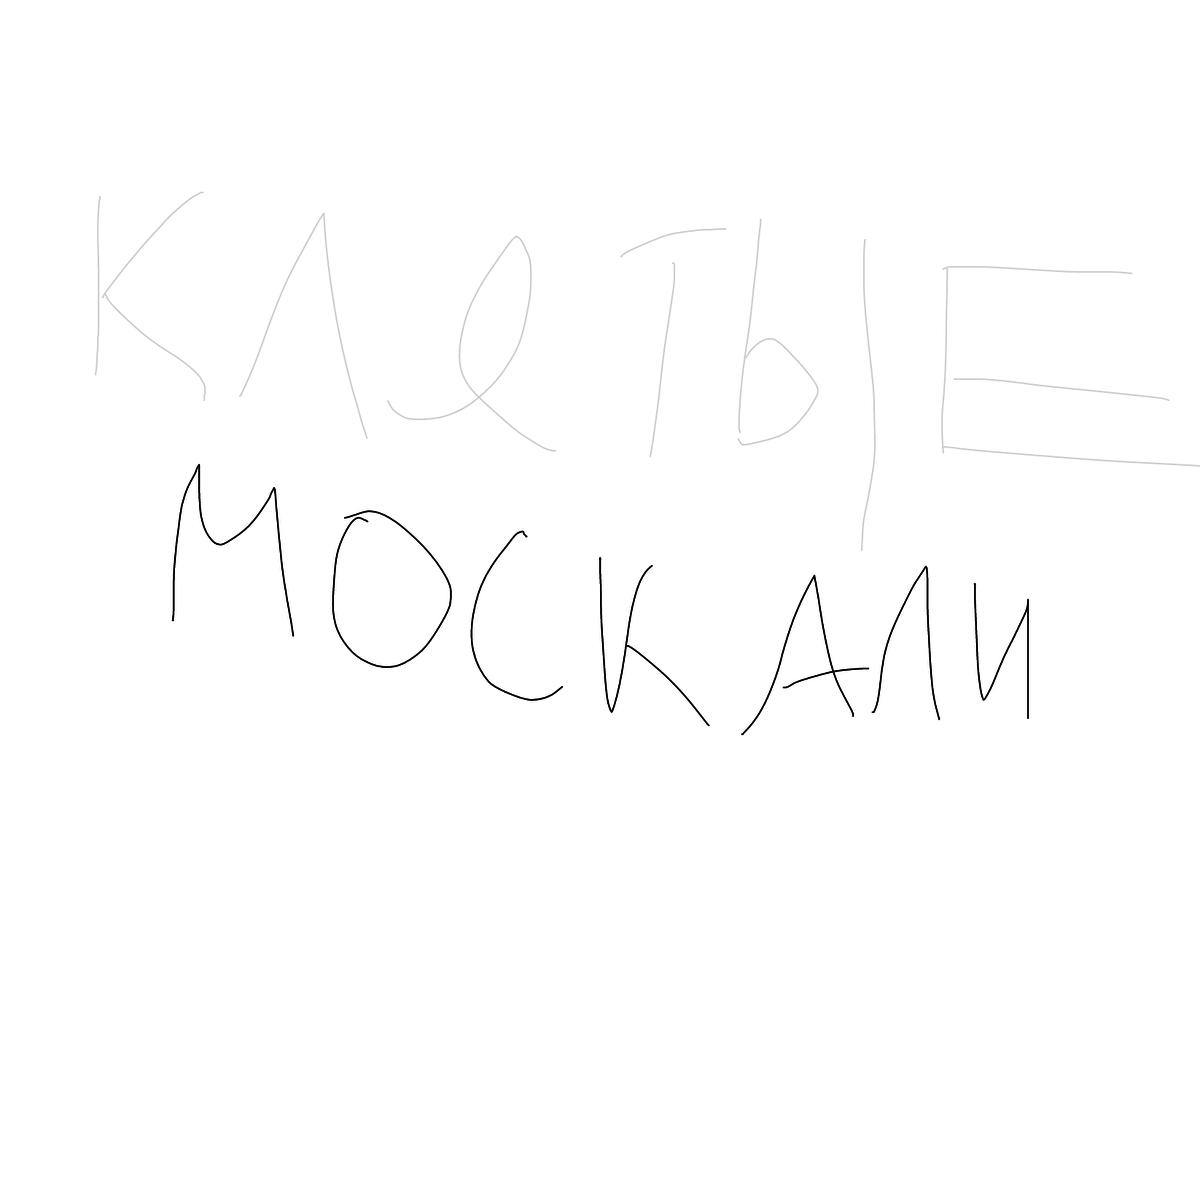 BAAAM drawing#21059 lat:55.7520866394043000lng: 37.6201667785644500